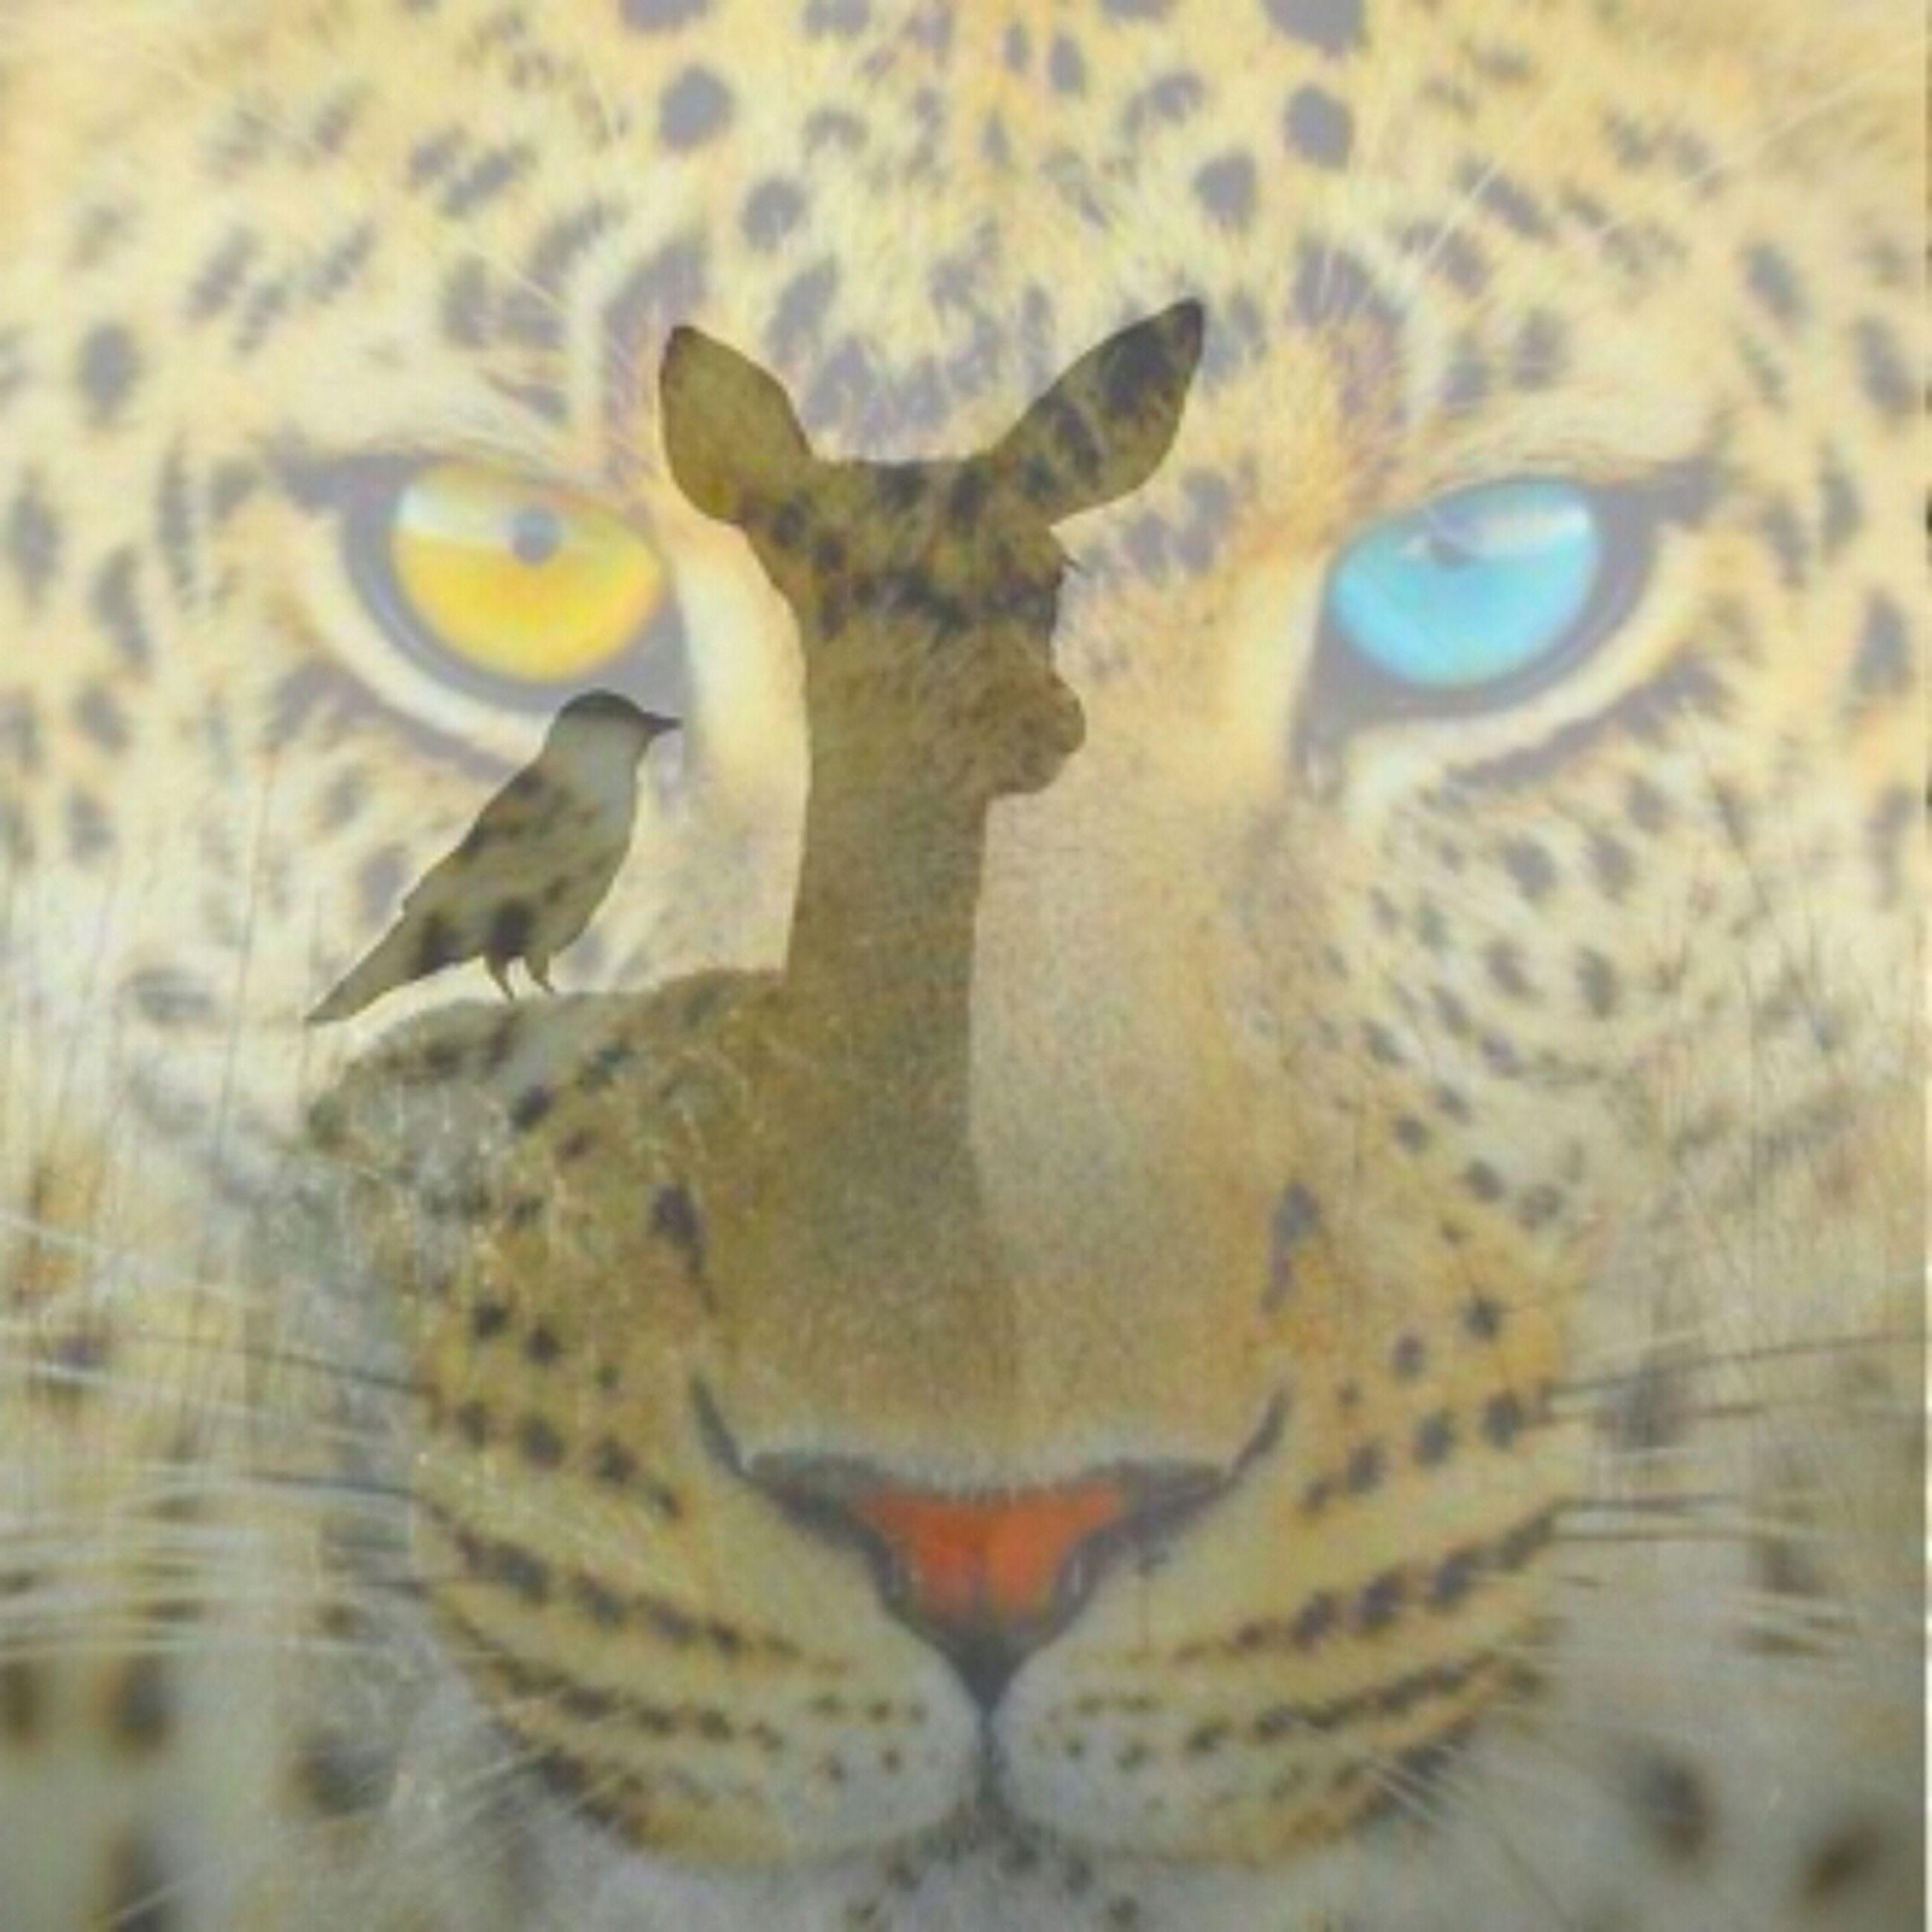 animal themes, one animal, animals in the wild, wildlife, animal head, bird, close-up, portrait, animal eye, looking at camera, animal body part, animal markings, no people, focus on foreground, nature, outdoors, zoology, vertebrate, beak